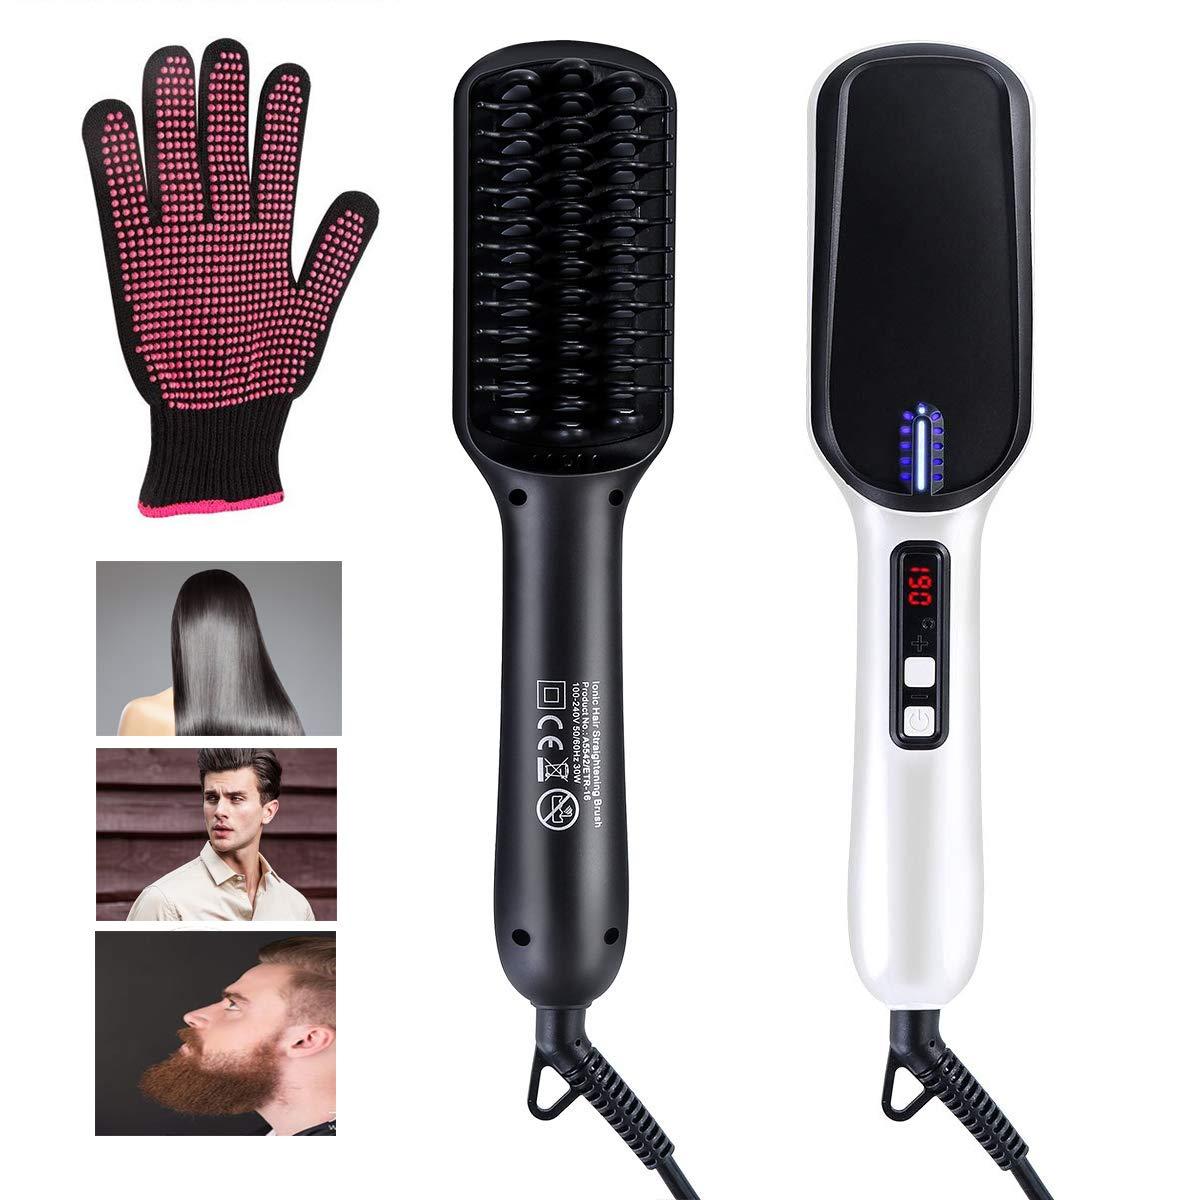 Beard Straightener Hair Straightener Brush -VIPpro Hair Straightening Comb,Auto Temperature Lock,Negative ions Anti,Professional Hair Straightening Brush for Women and Men, For Home and Travel